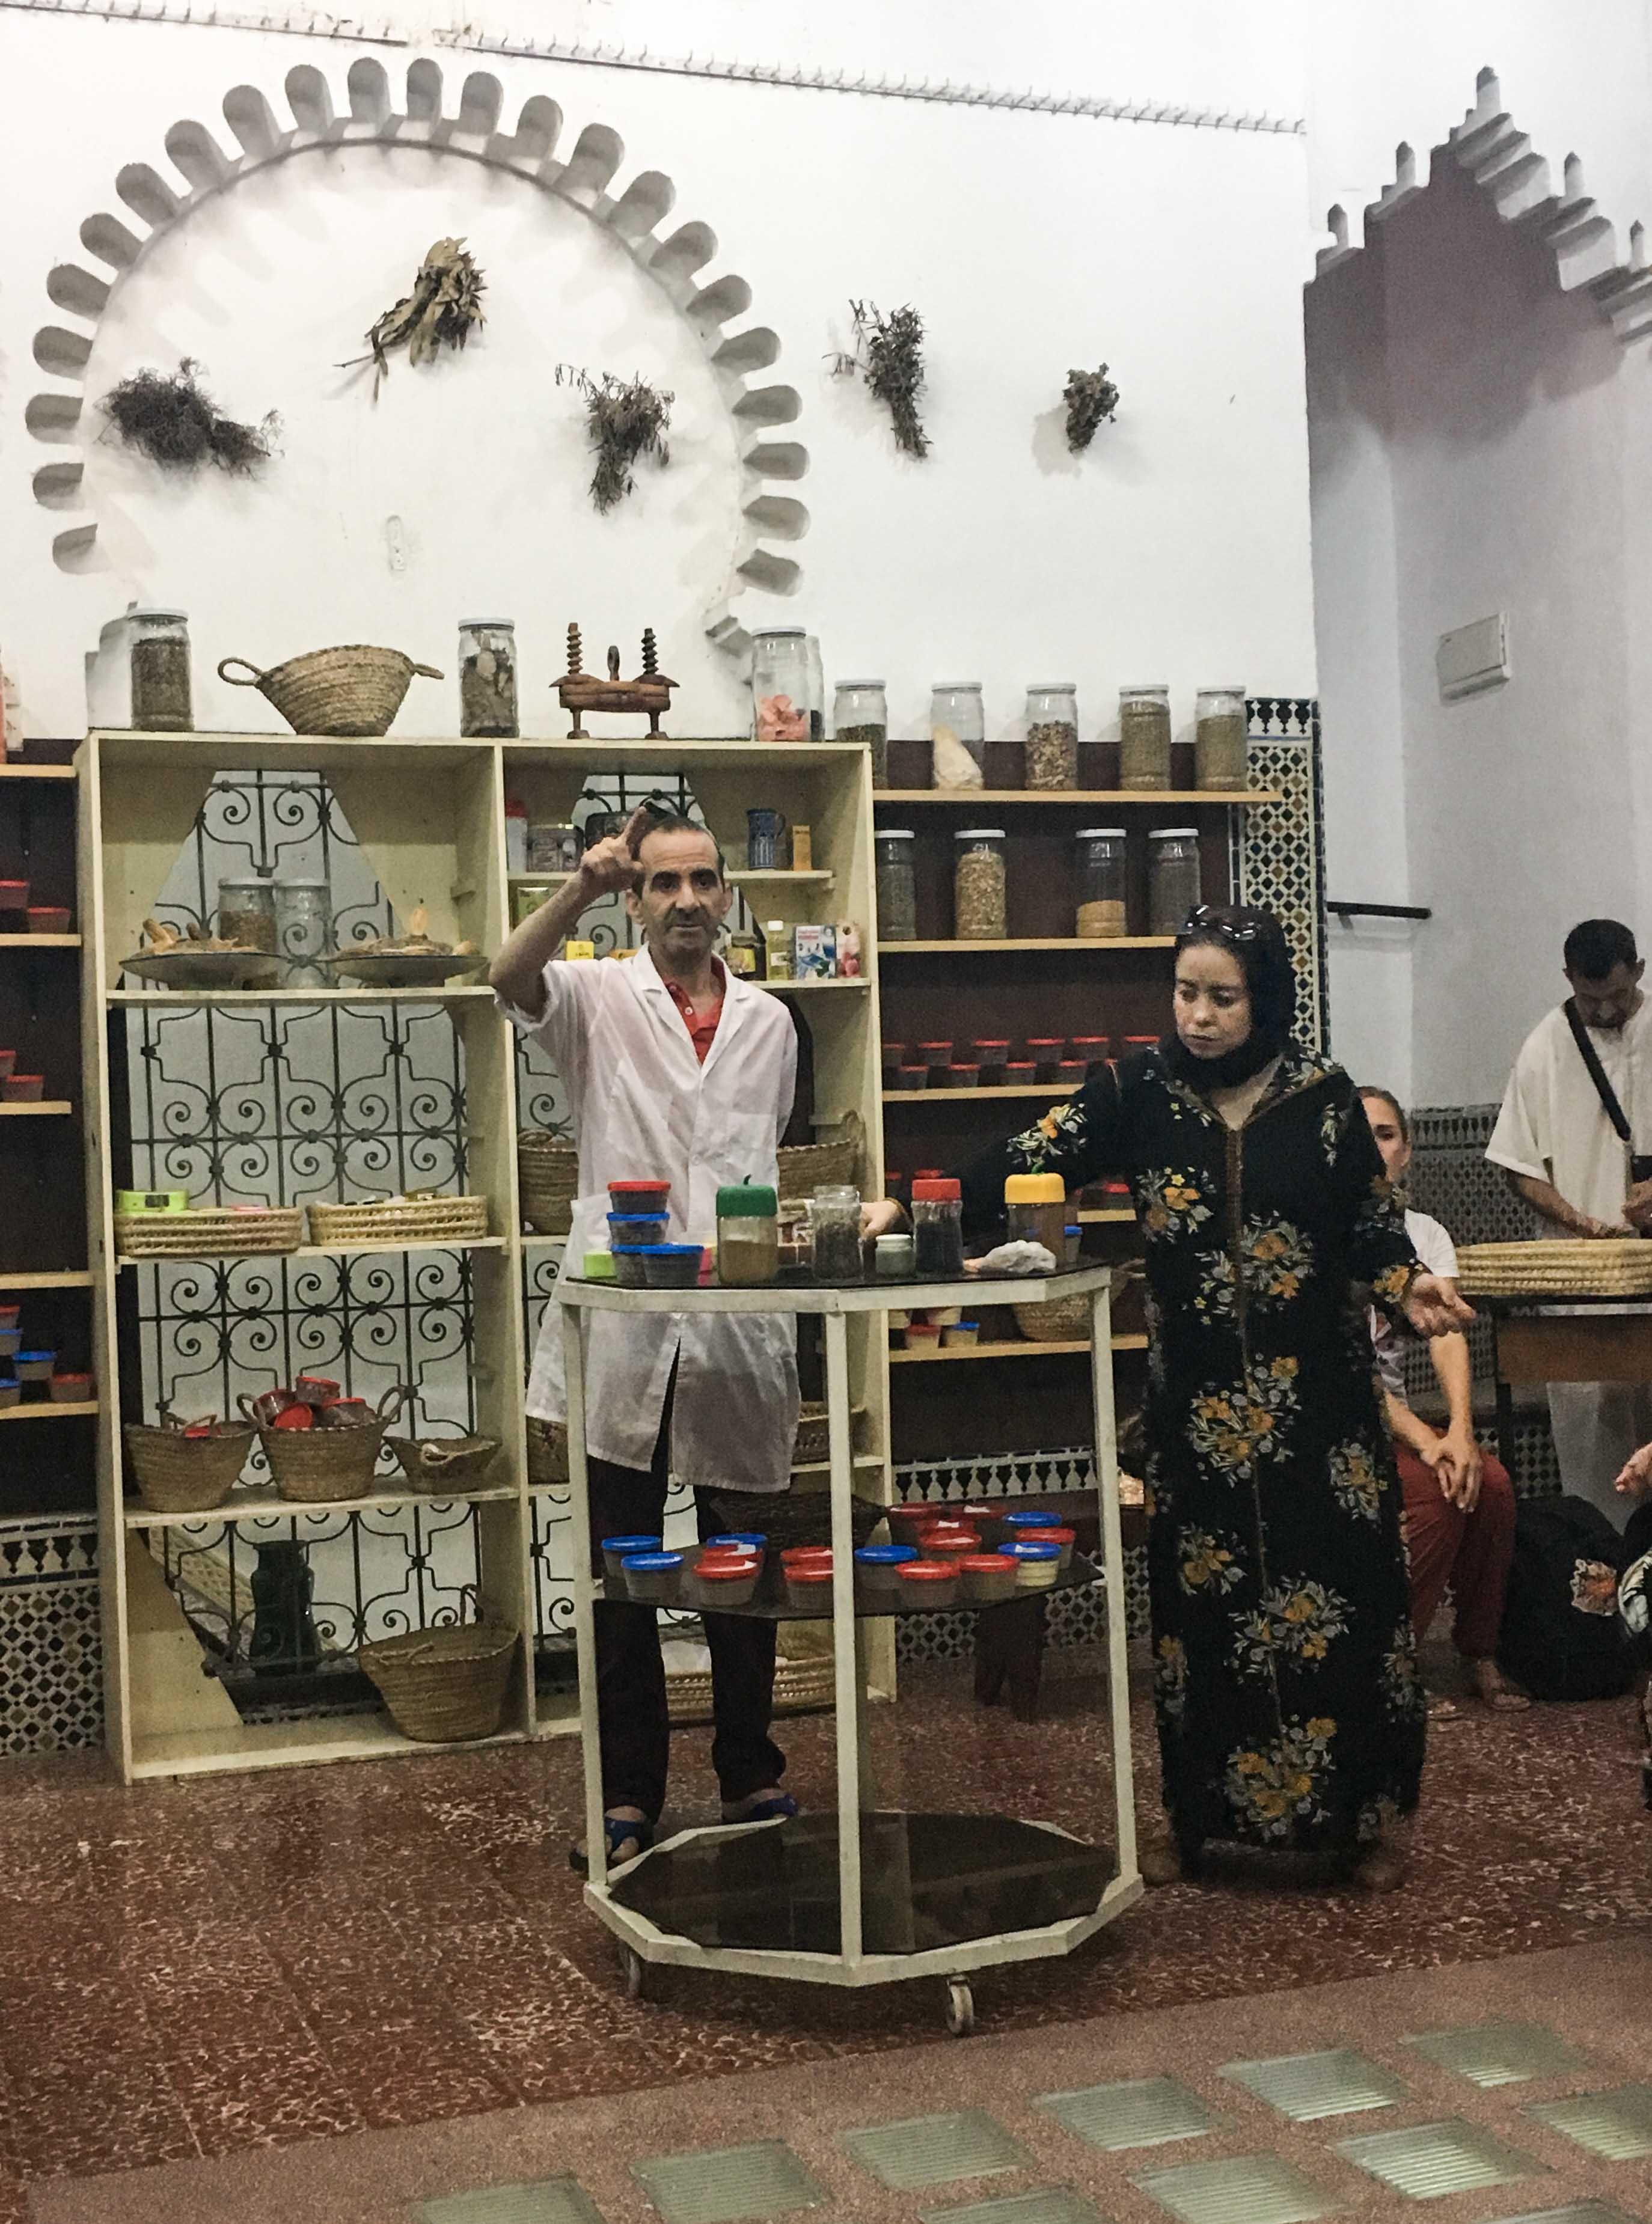 bus-tour-spanien-marokko-gibraltar-reiseblog-travelblog-reiseübelkeit-tipps-road-trip_7052